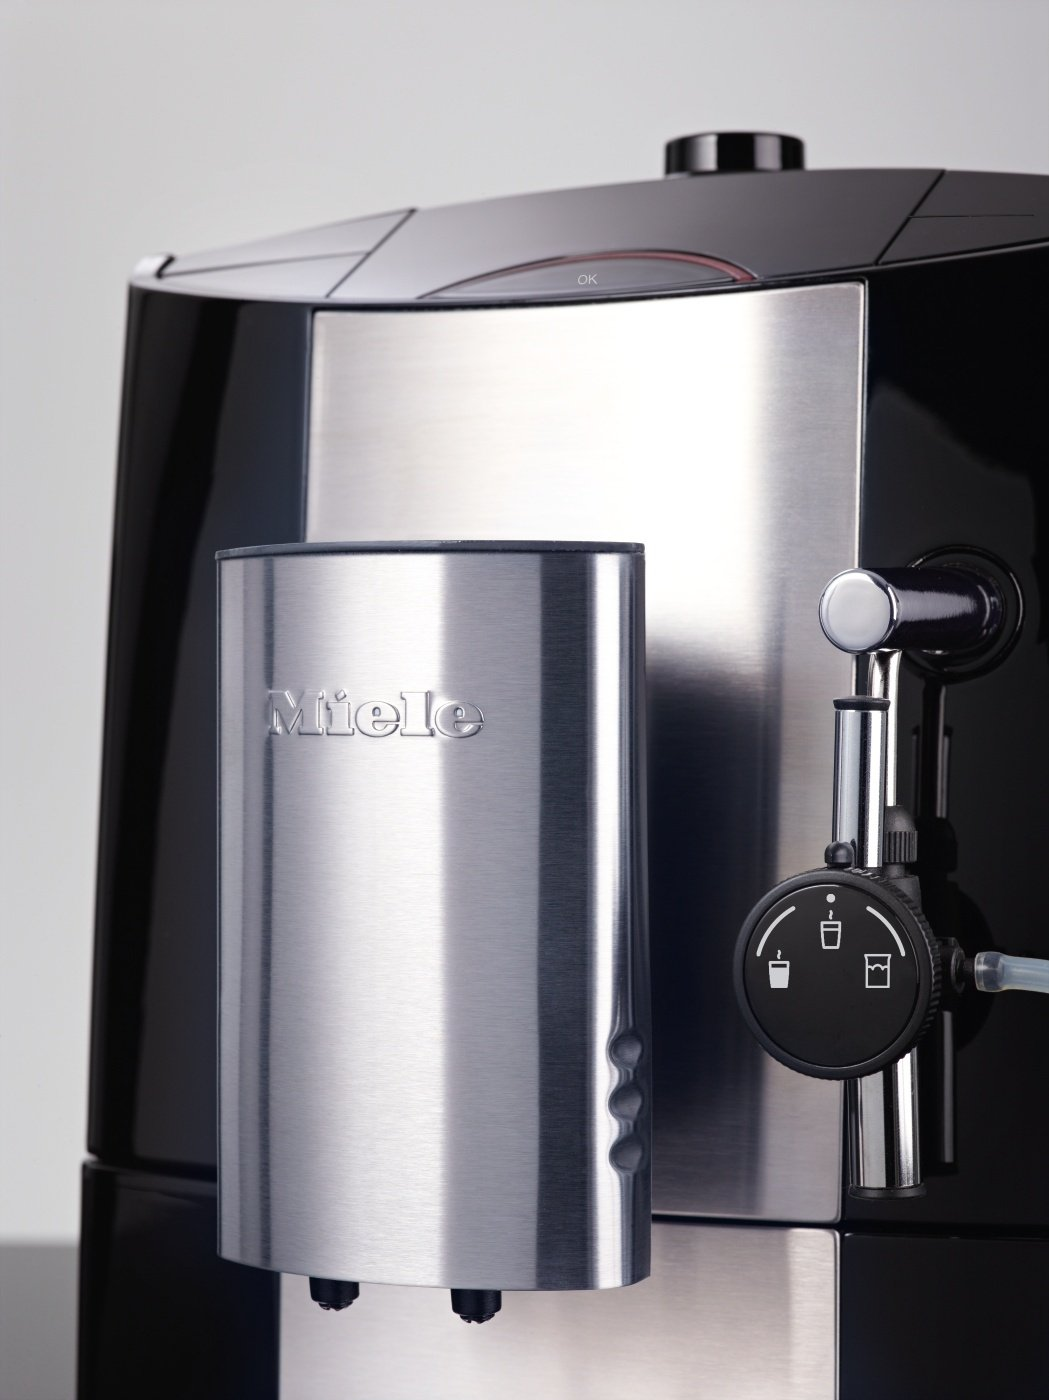 miele cm 5100 kaffee vollautomat in tiefschwarz f r 499 frei haus zackzack. Black Bedroom Furniture Sets. Home Design Ideas